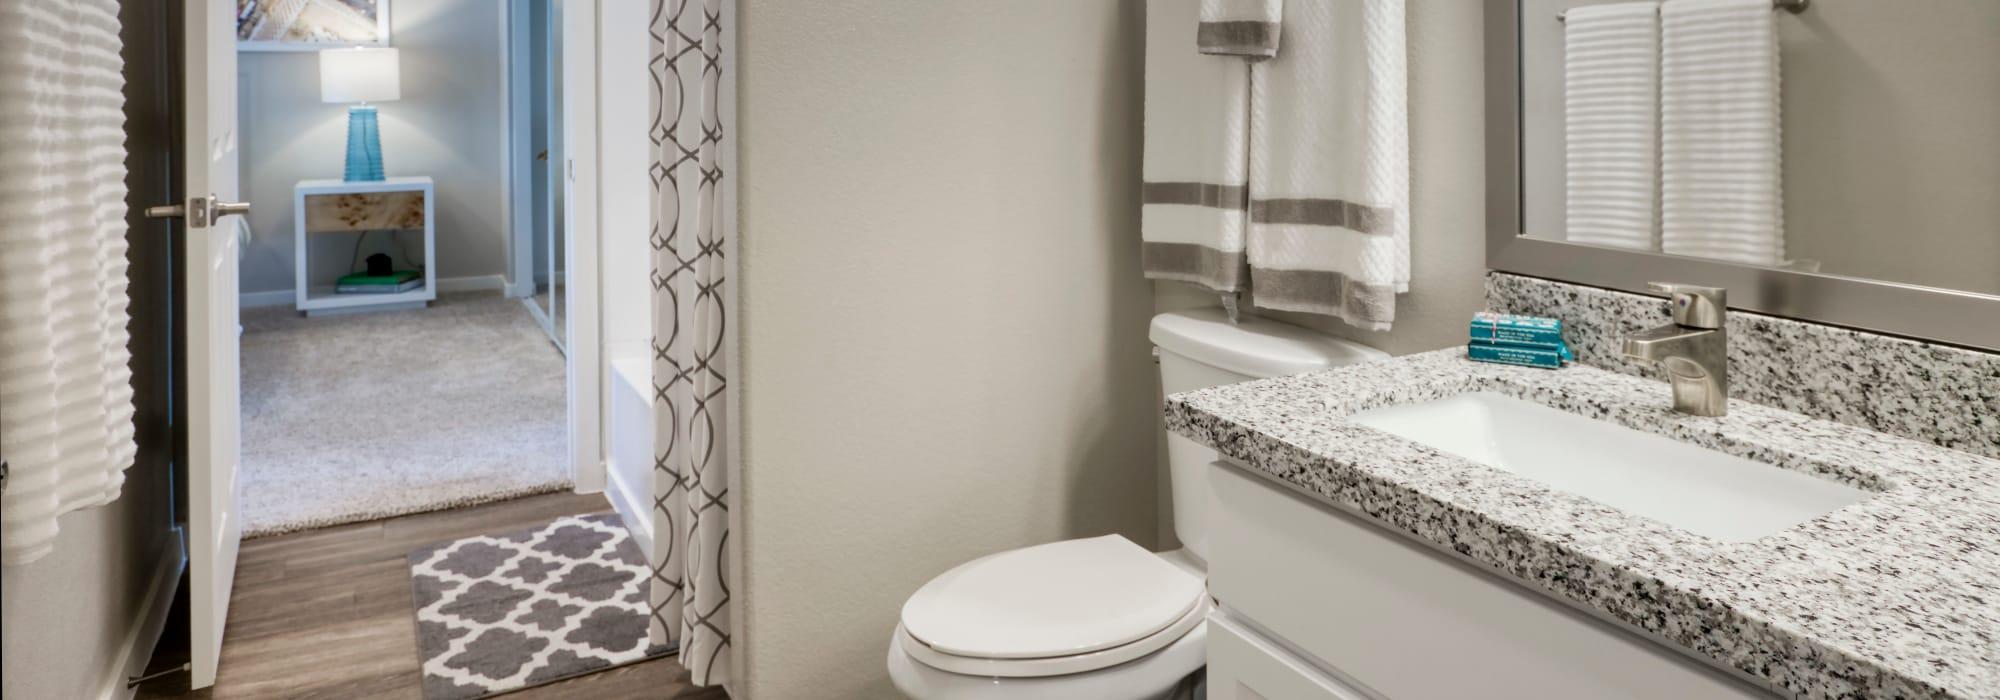 Bathroom at Waterside at Ocotillo